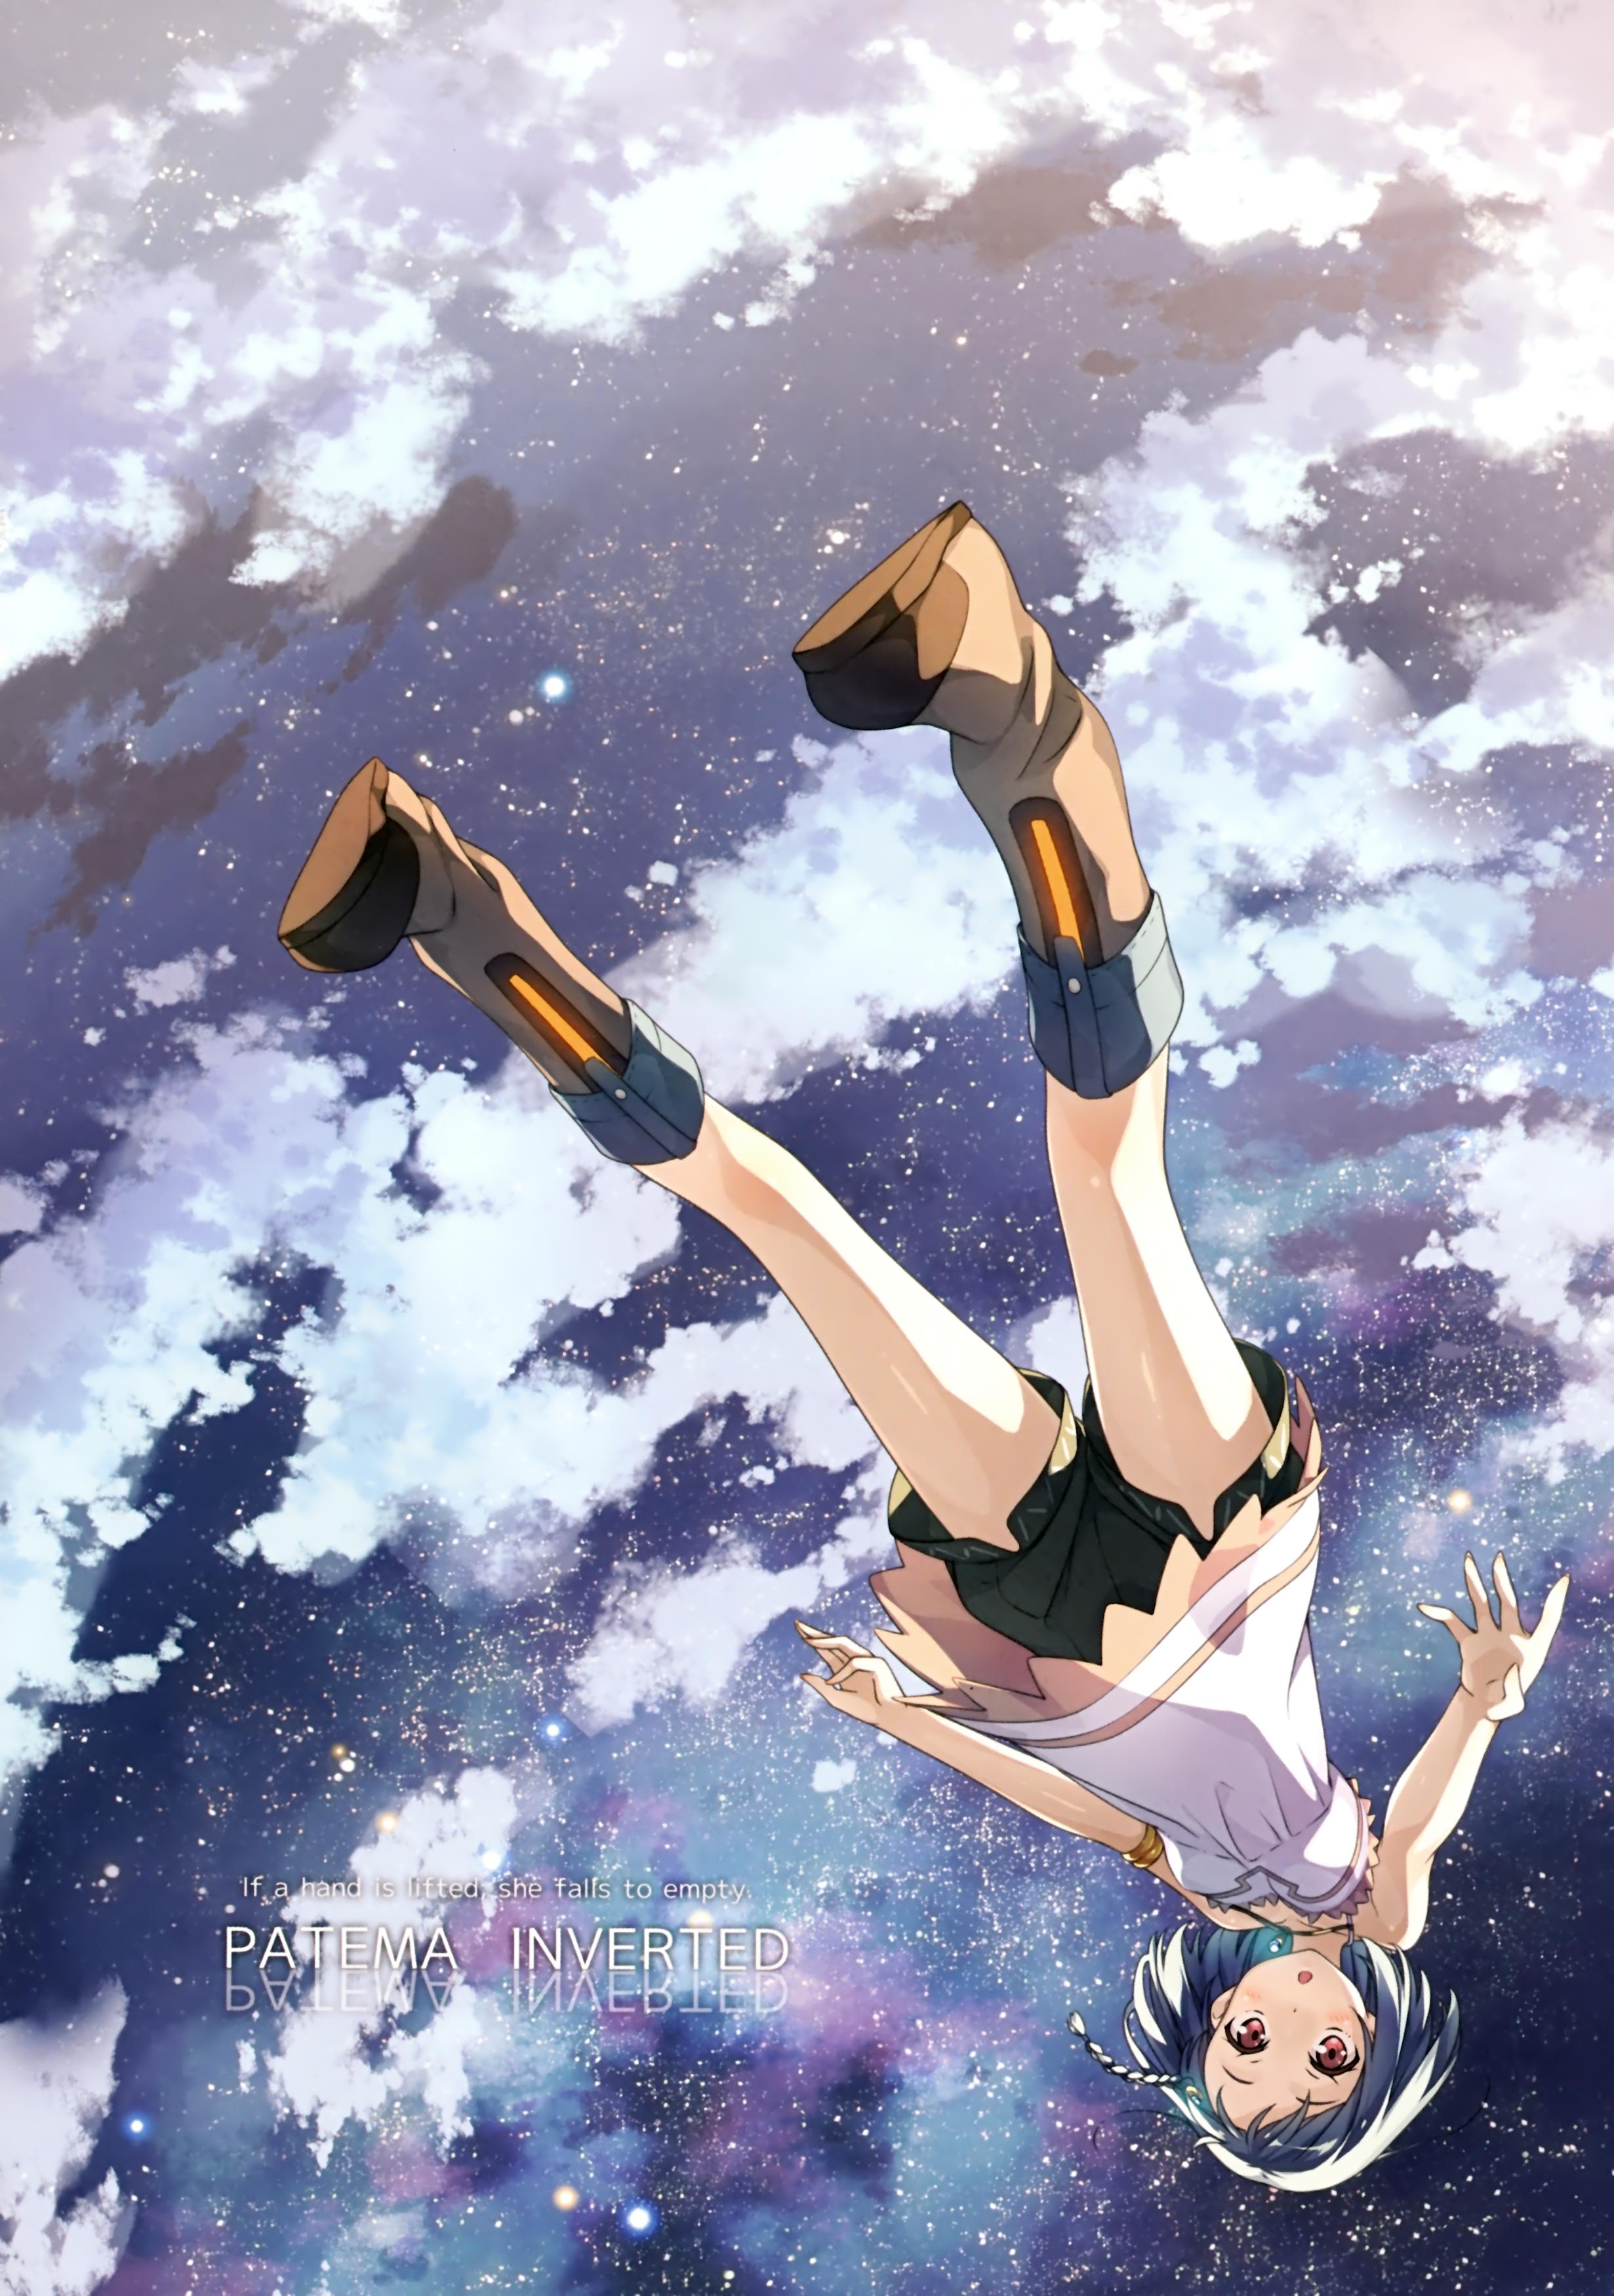 Sakasama no Patema (Patema Inverted) - Zerochan Anime ...